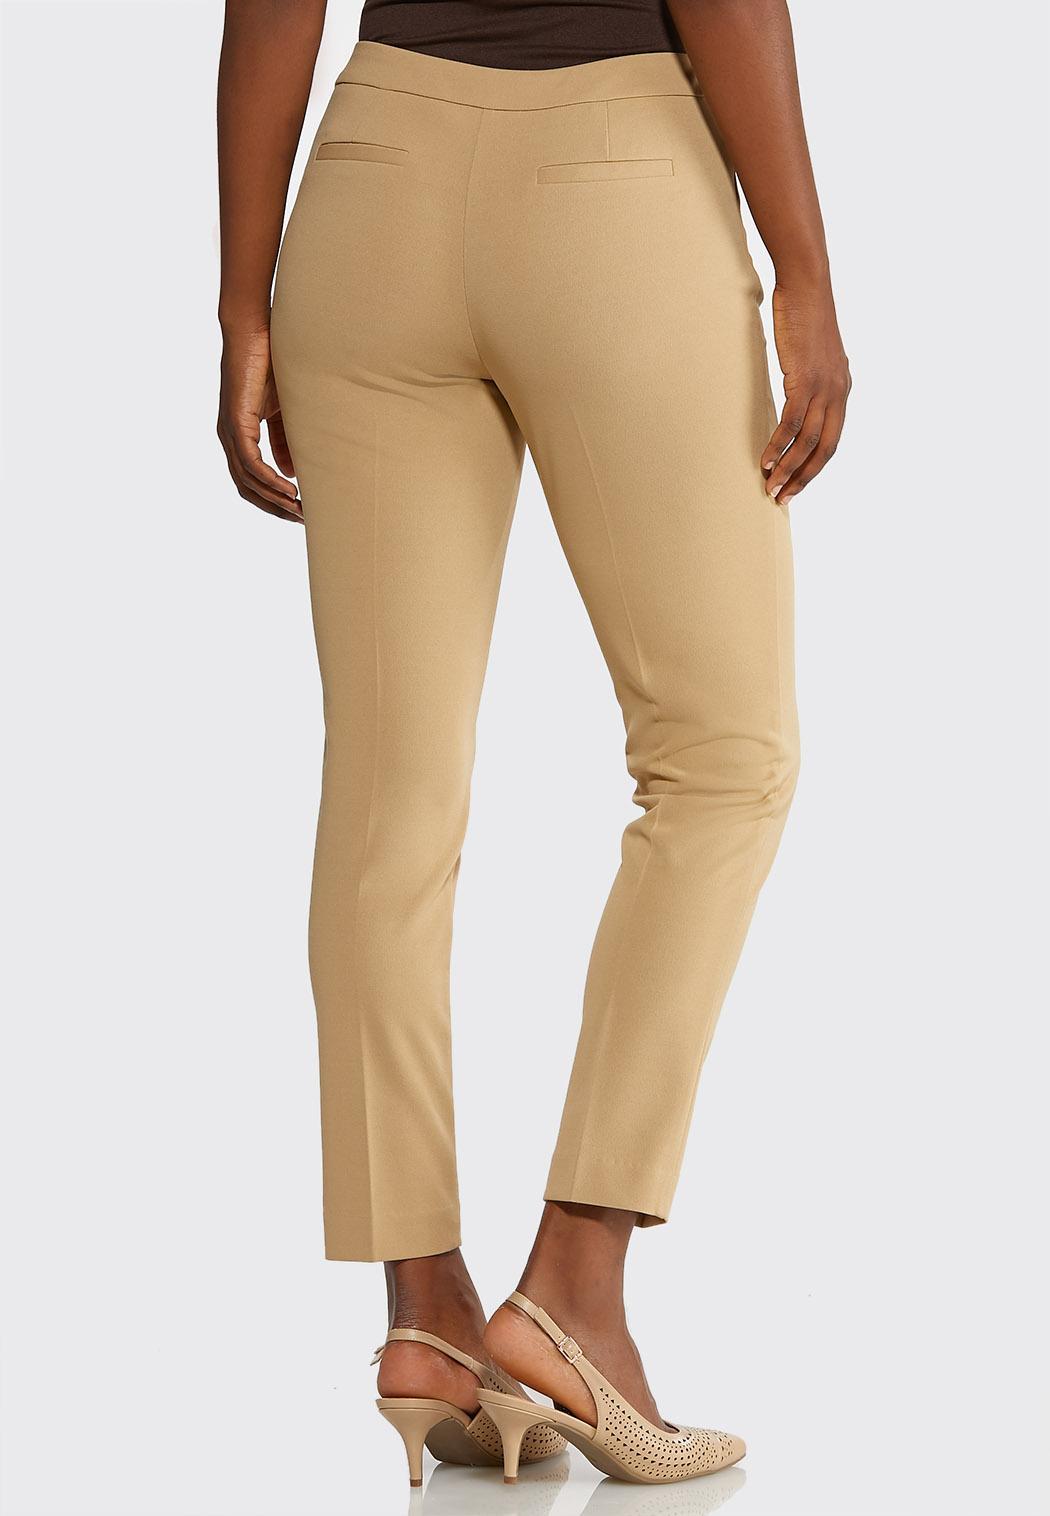 Petite Slim Leg Dressy Knit Pants (Item #43892392)